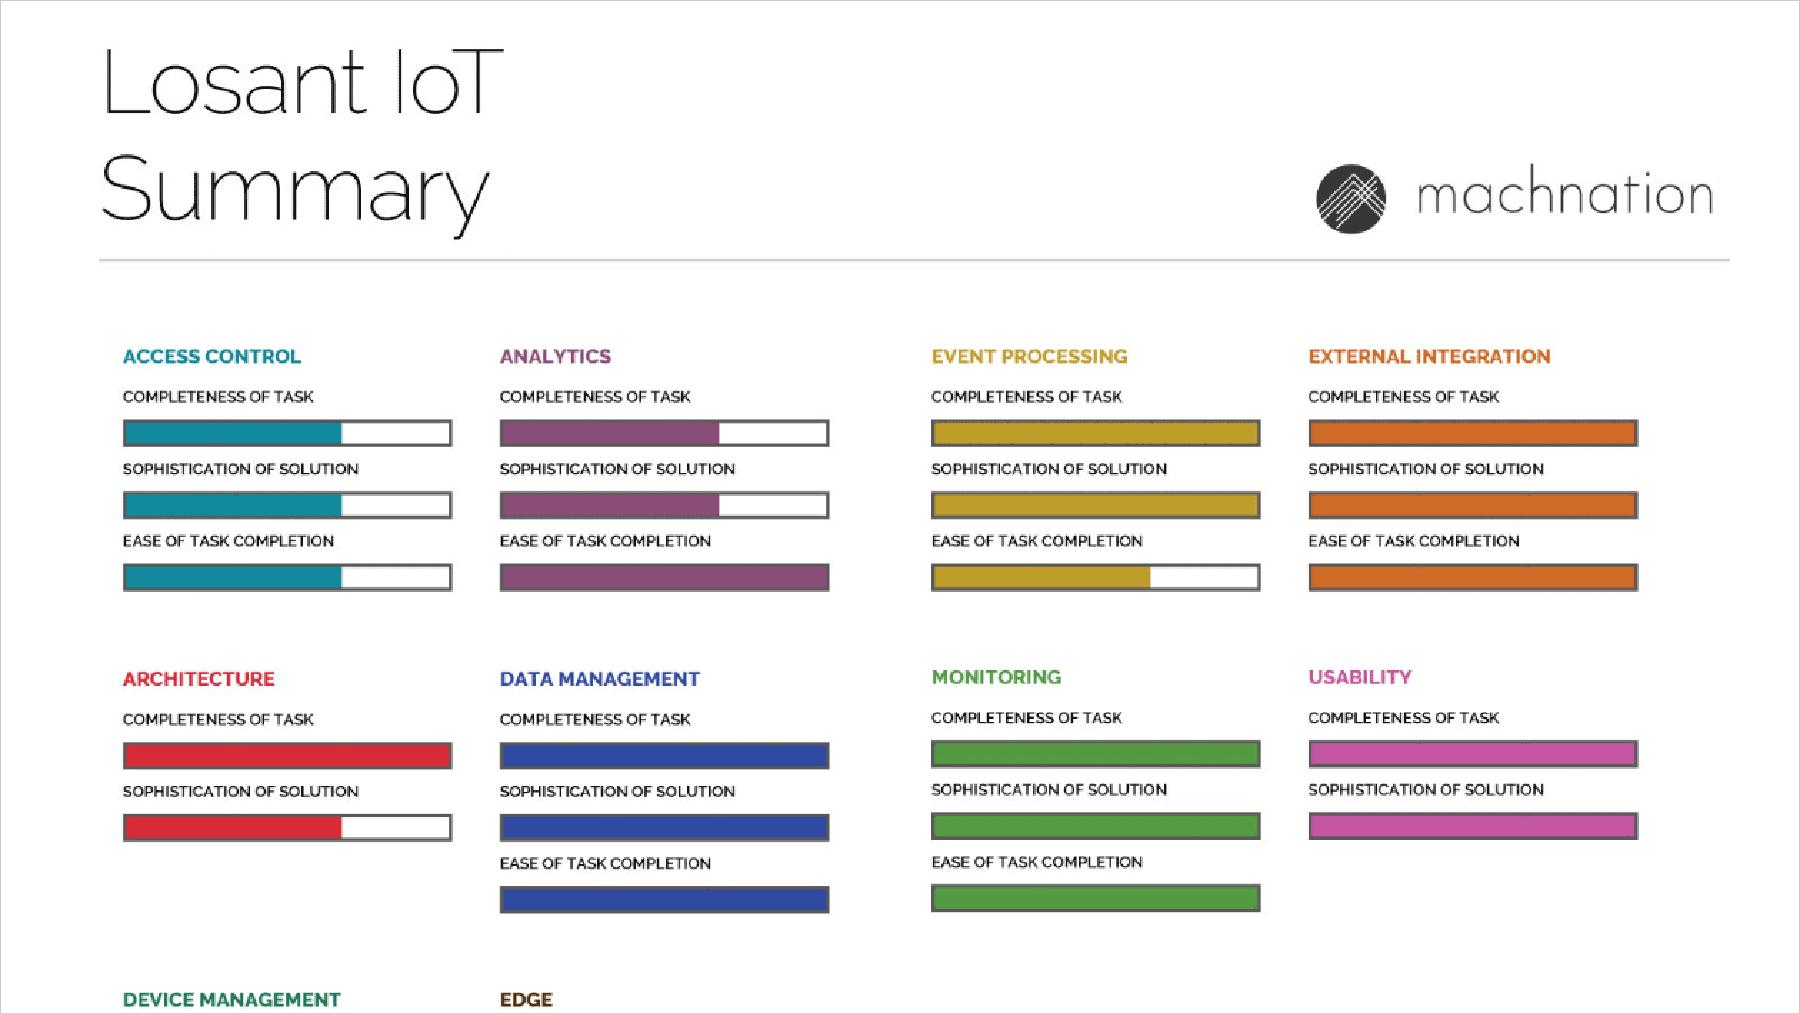 machnation-summary-iot